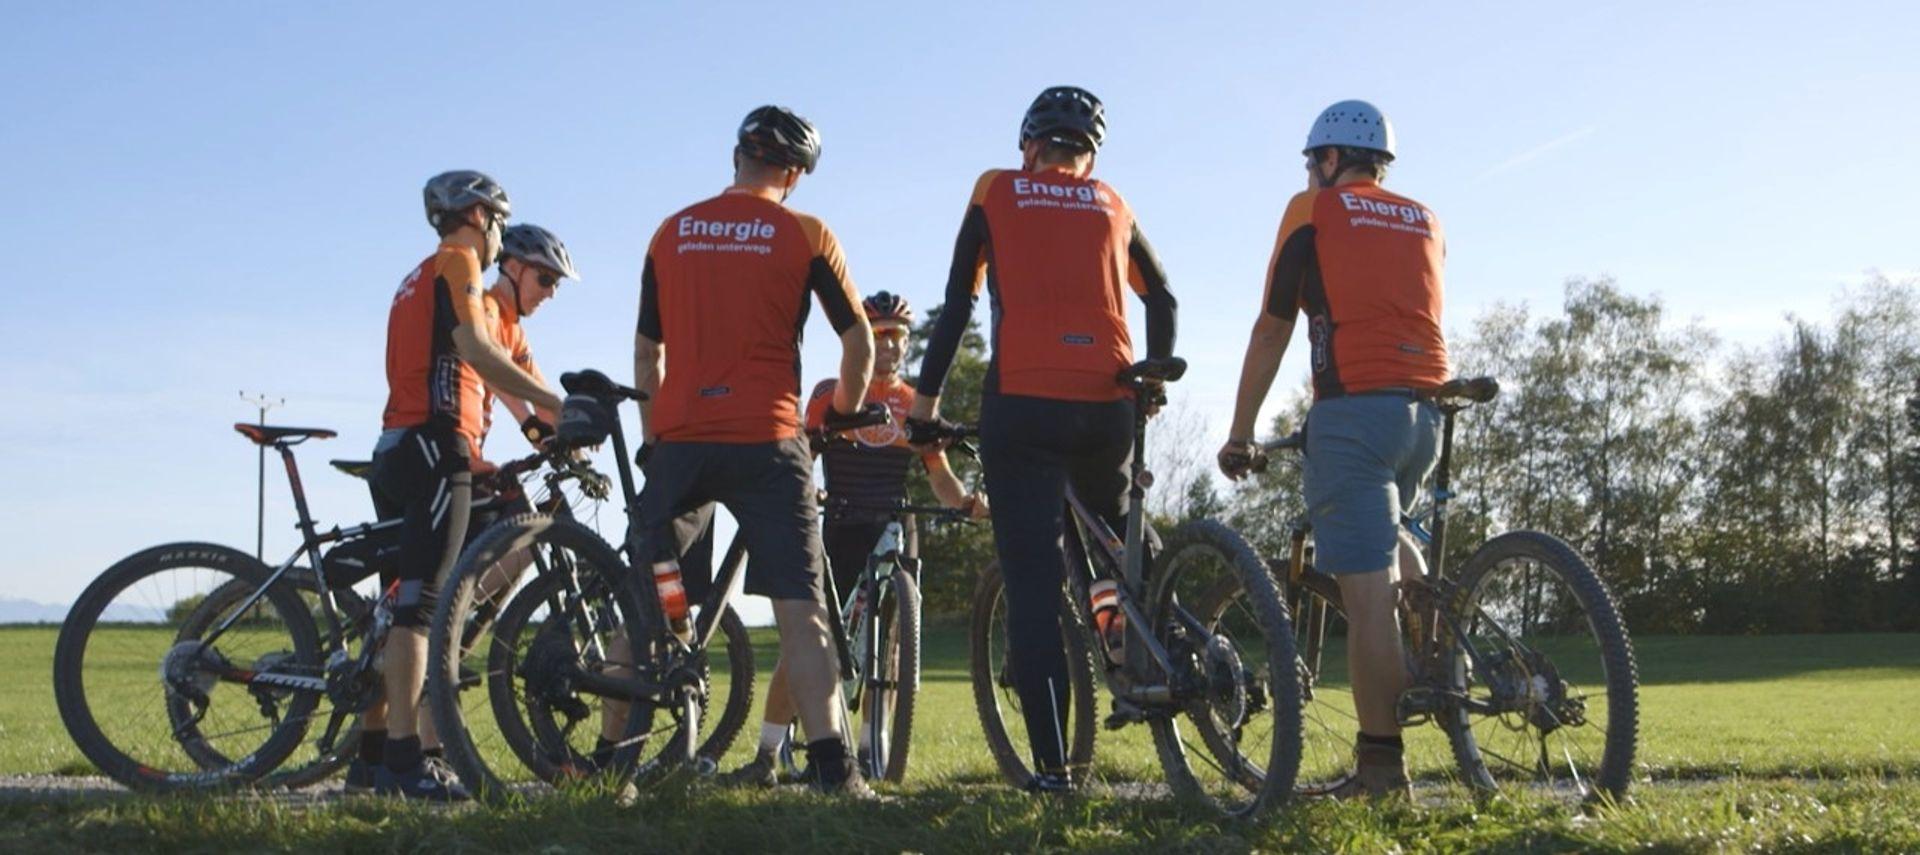 #cyclingforculture - Kilometer statt Corona!